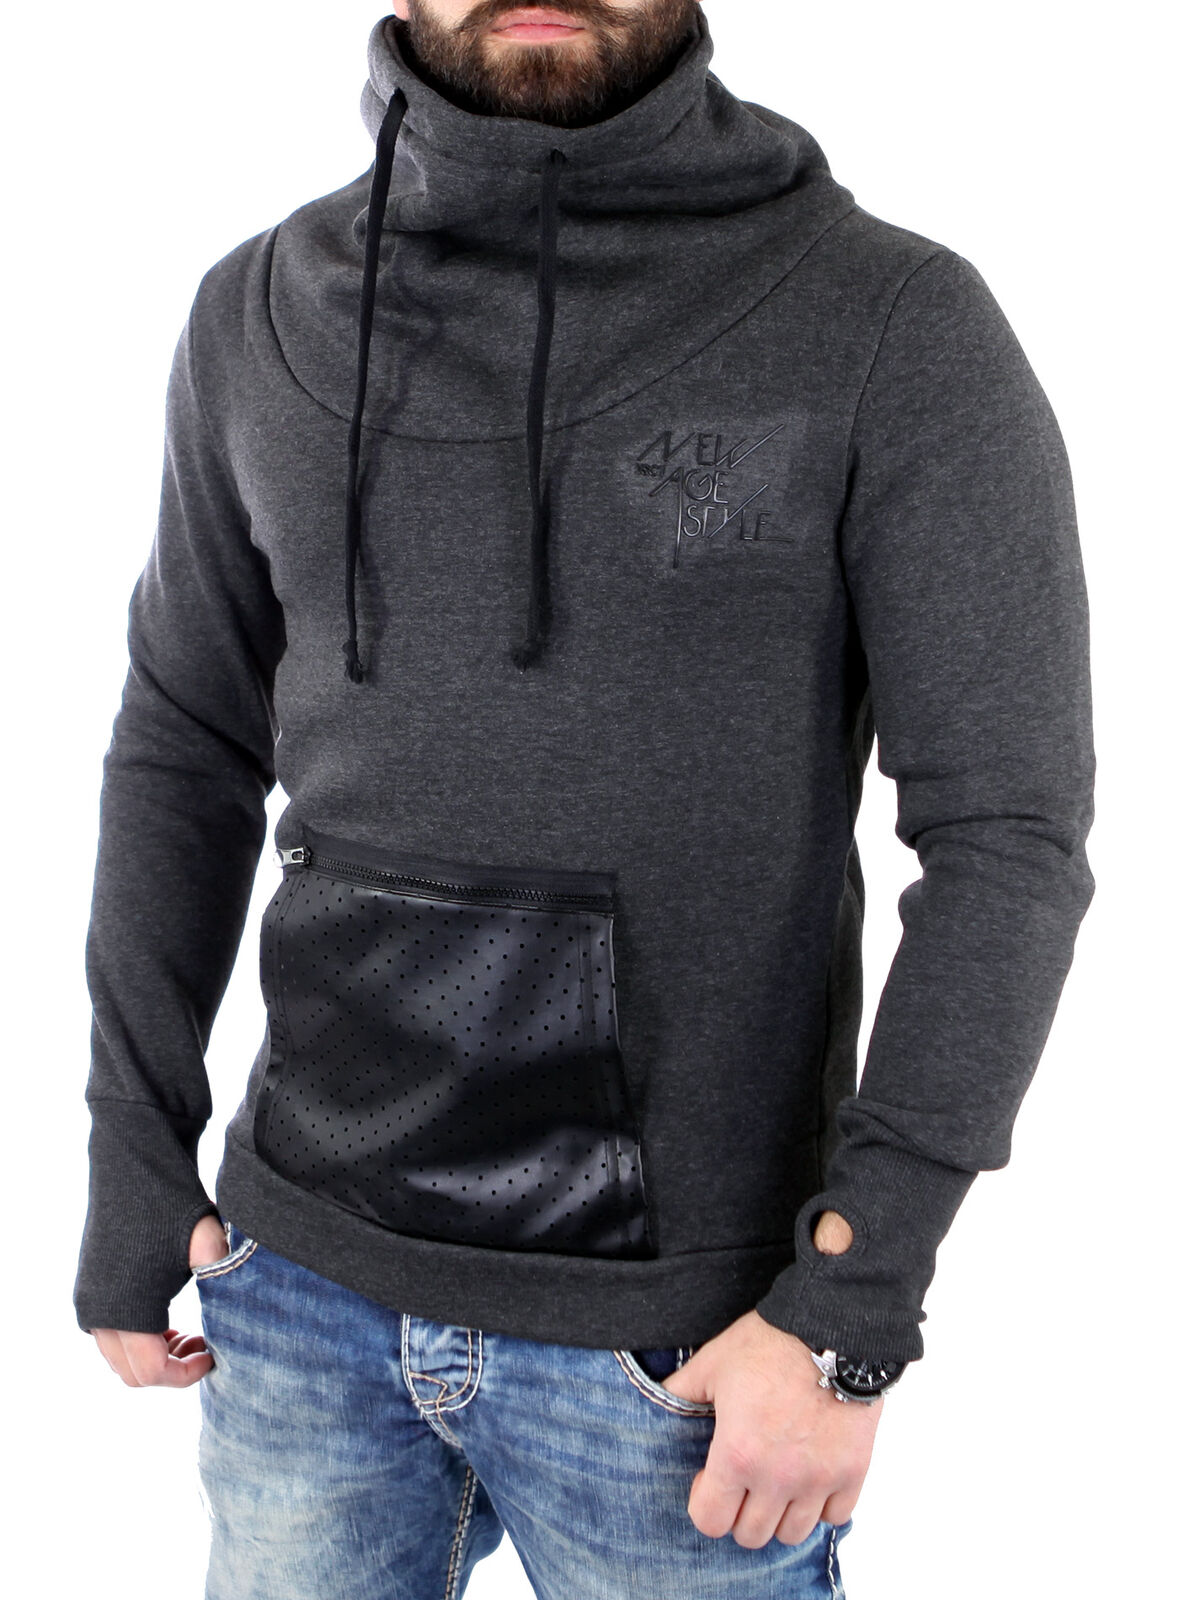 VSCT Sweatshirt Herren Tube Hoody Zip-Mesh-Tasche Pullover Hoodie V-5641439 V-5641439 V-5641439 Neu | Beliebte Empfehlung  710d3c